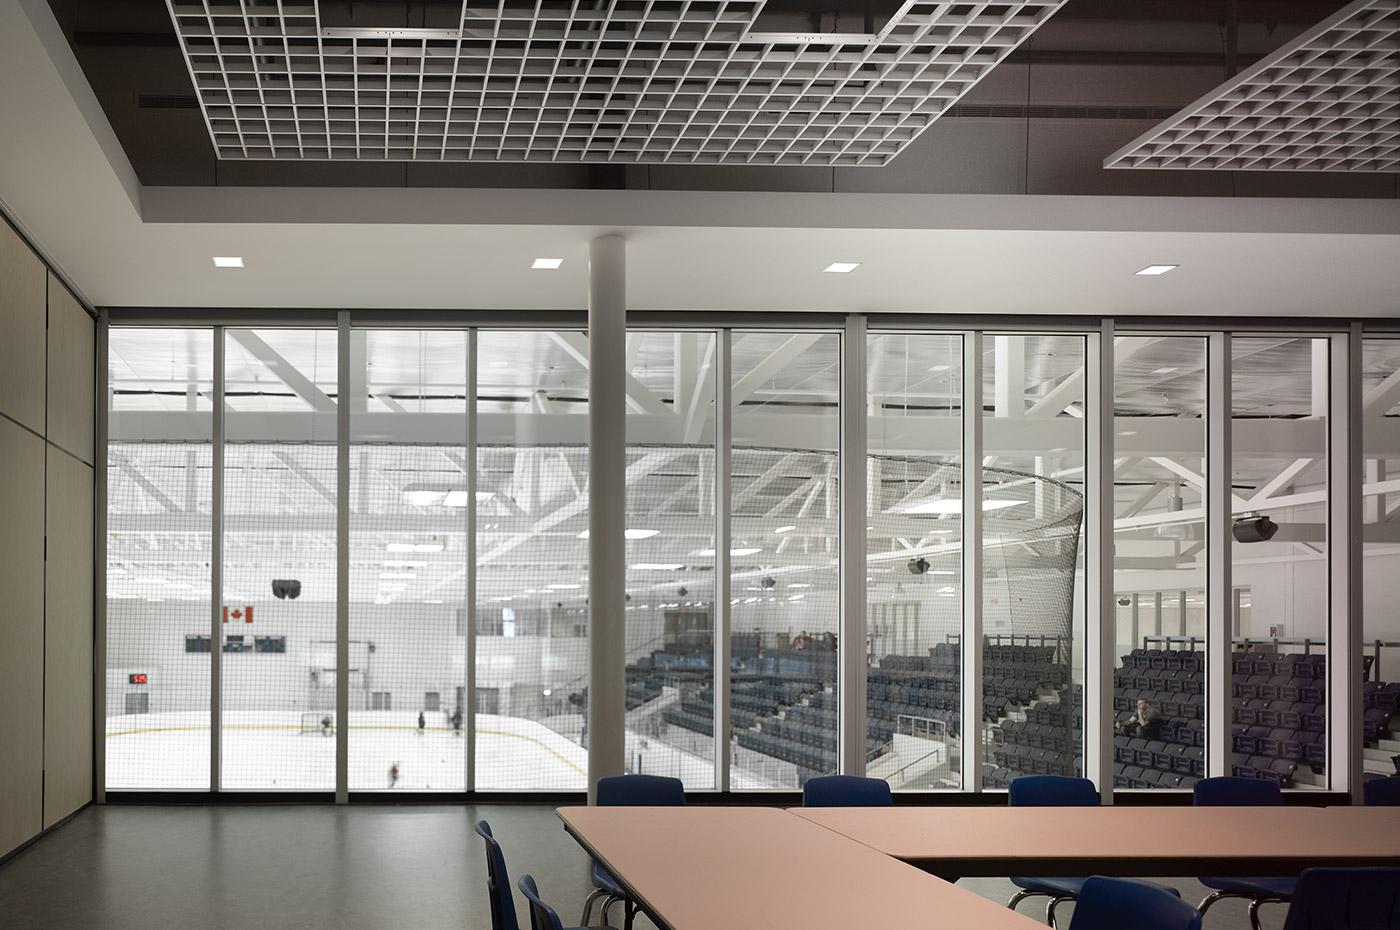 Bradford West Gwillimbury Leisure Centre Ice Rink